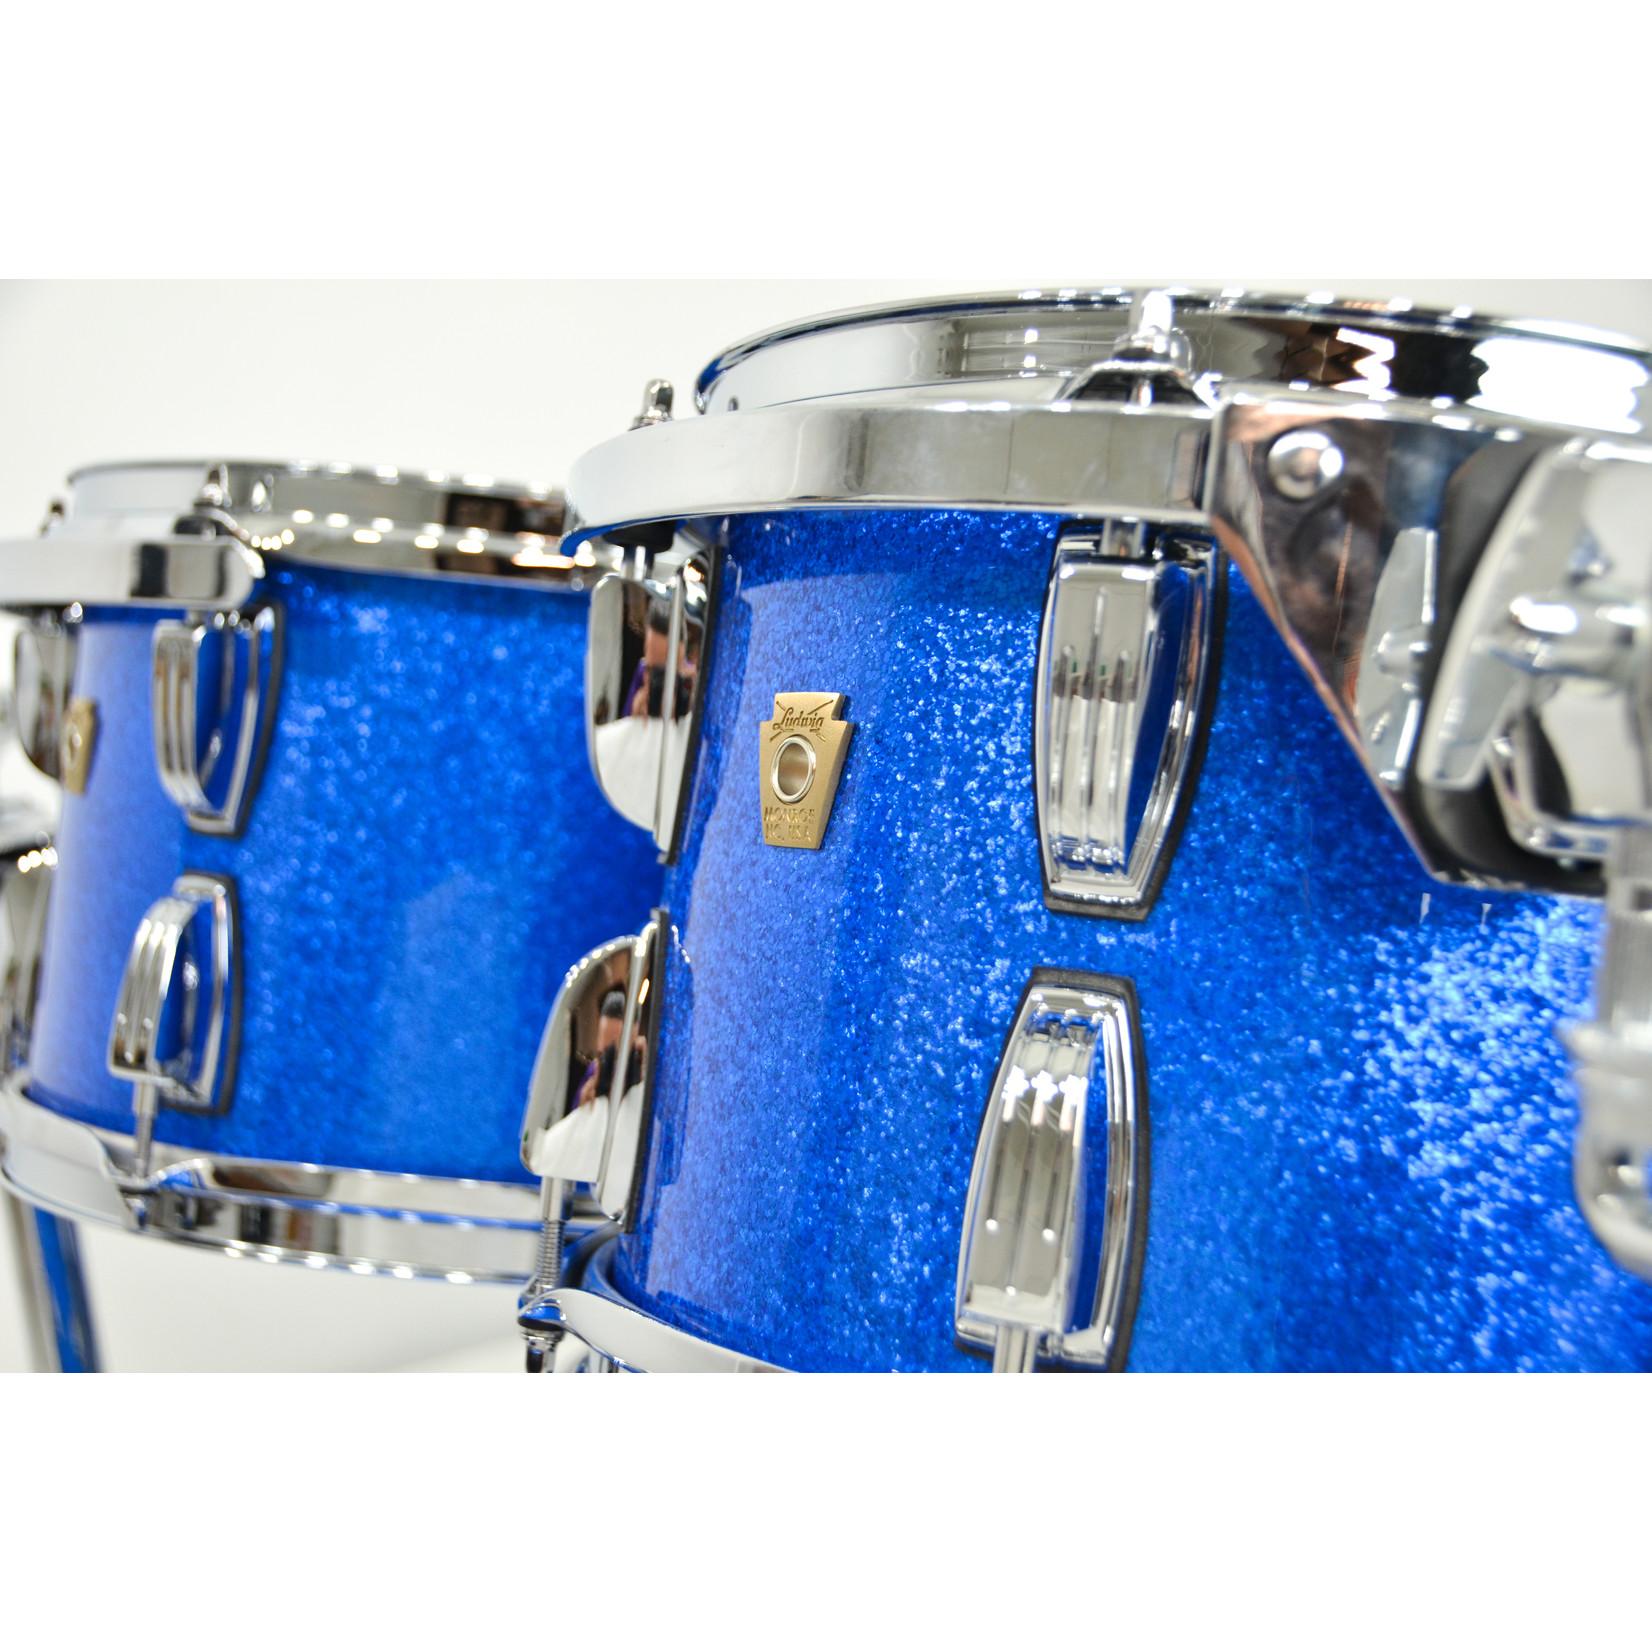 "Ludwig Ludwig Classic Maple 4pc Drum kit - ""Blue Sparkle"""